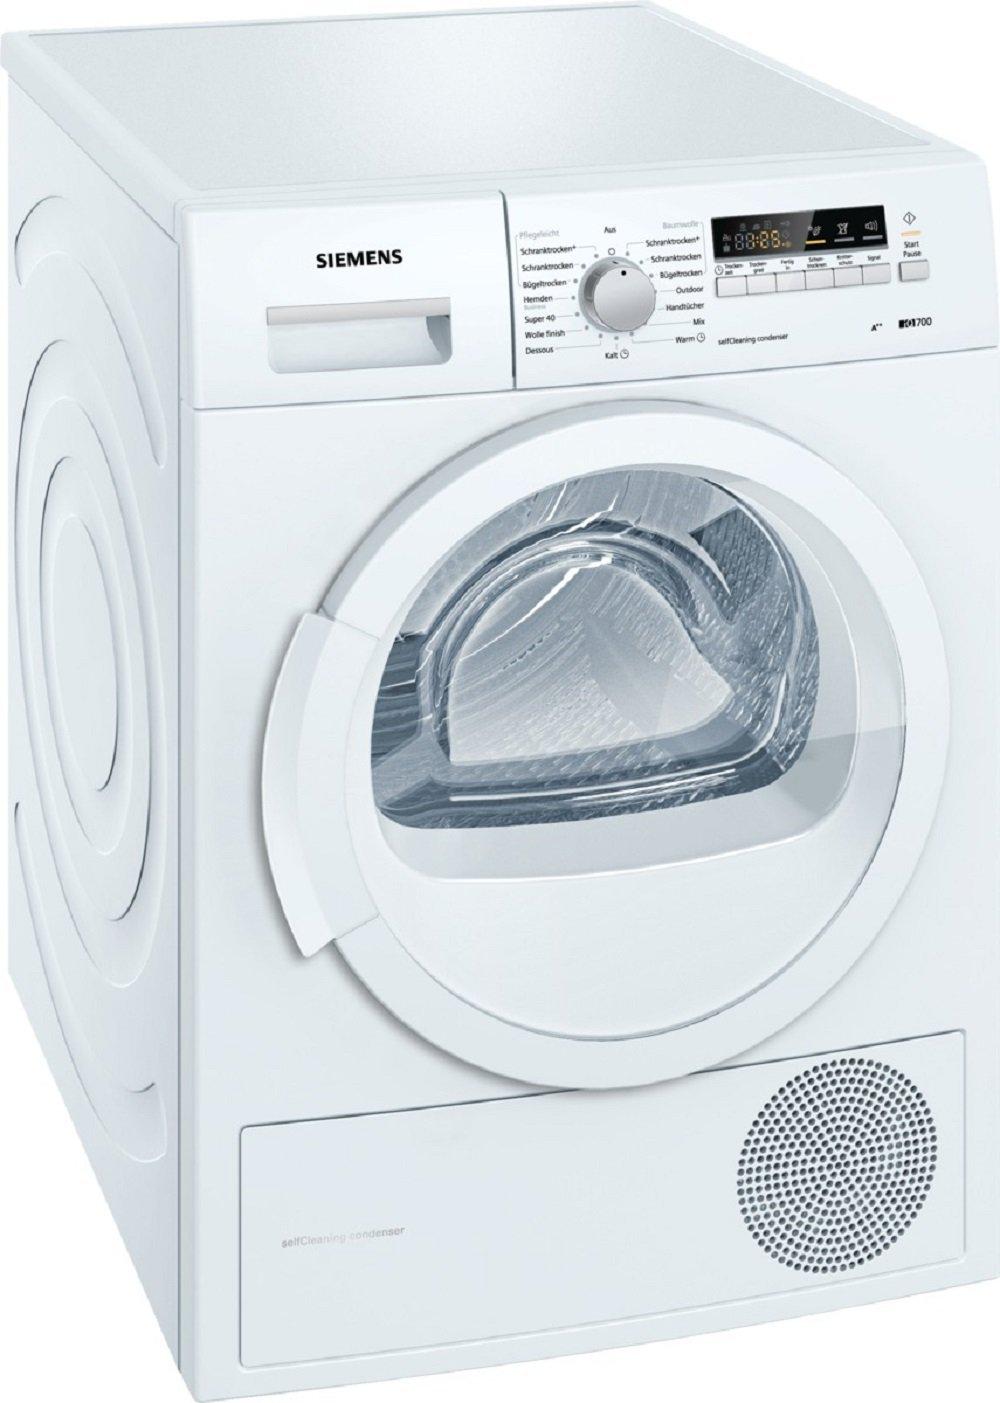 Siemens WT46W261